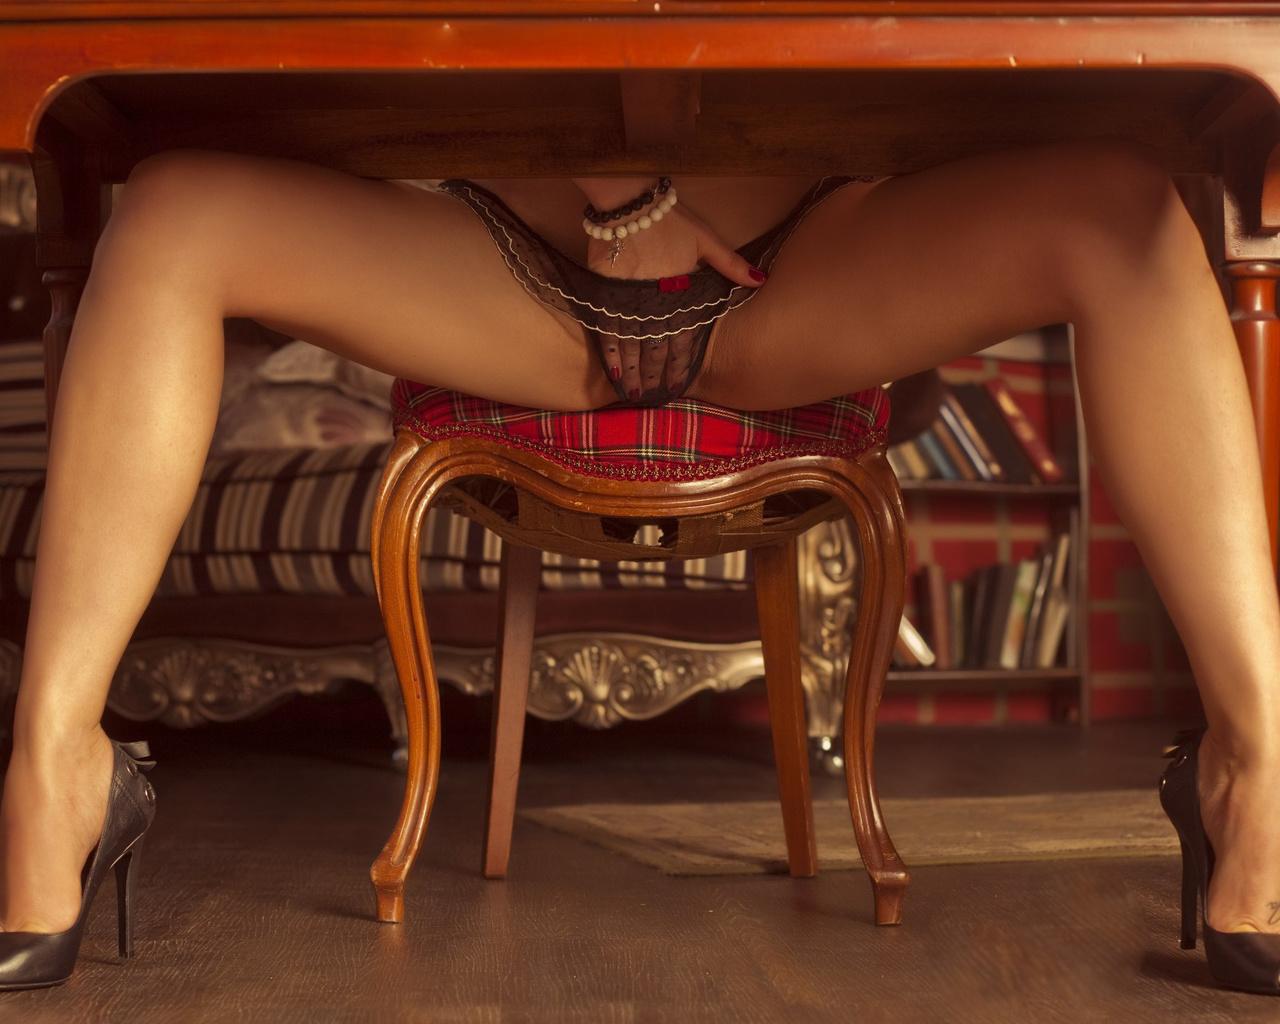 Стриптиз за барным стулом, Стриптиз на стуле - видео Yo-Sex 25 фотография